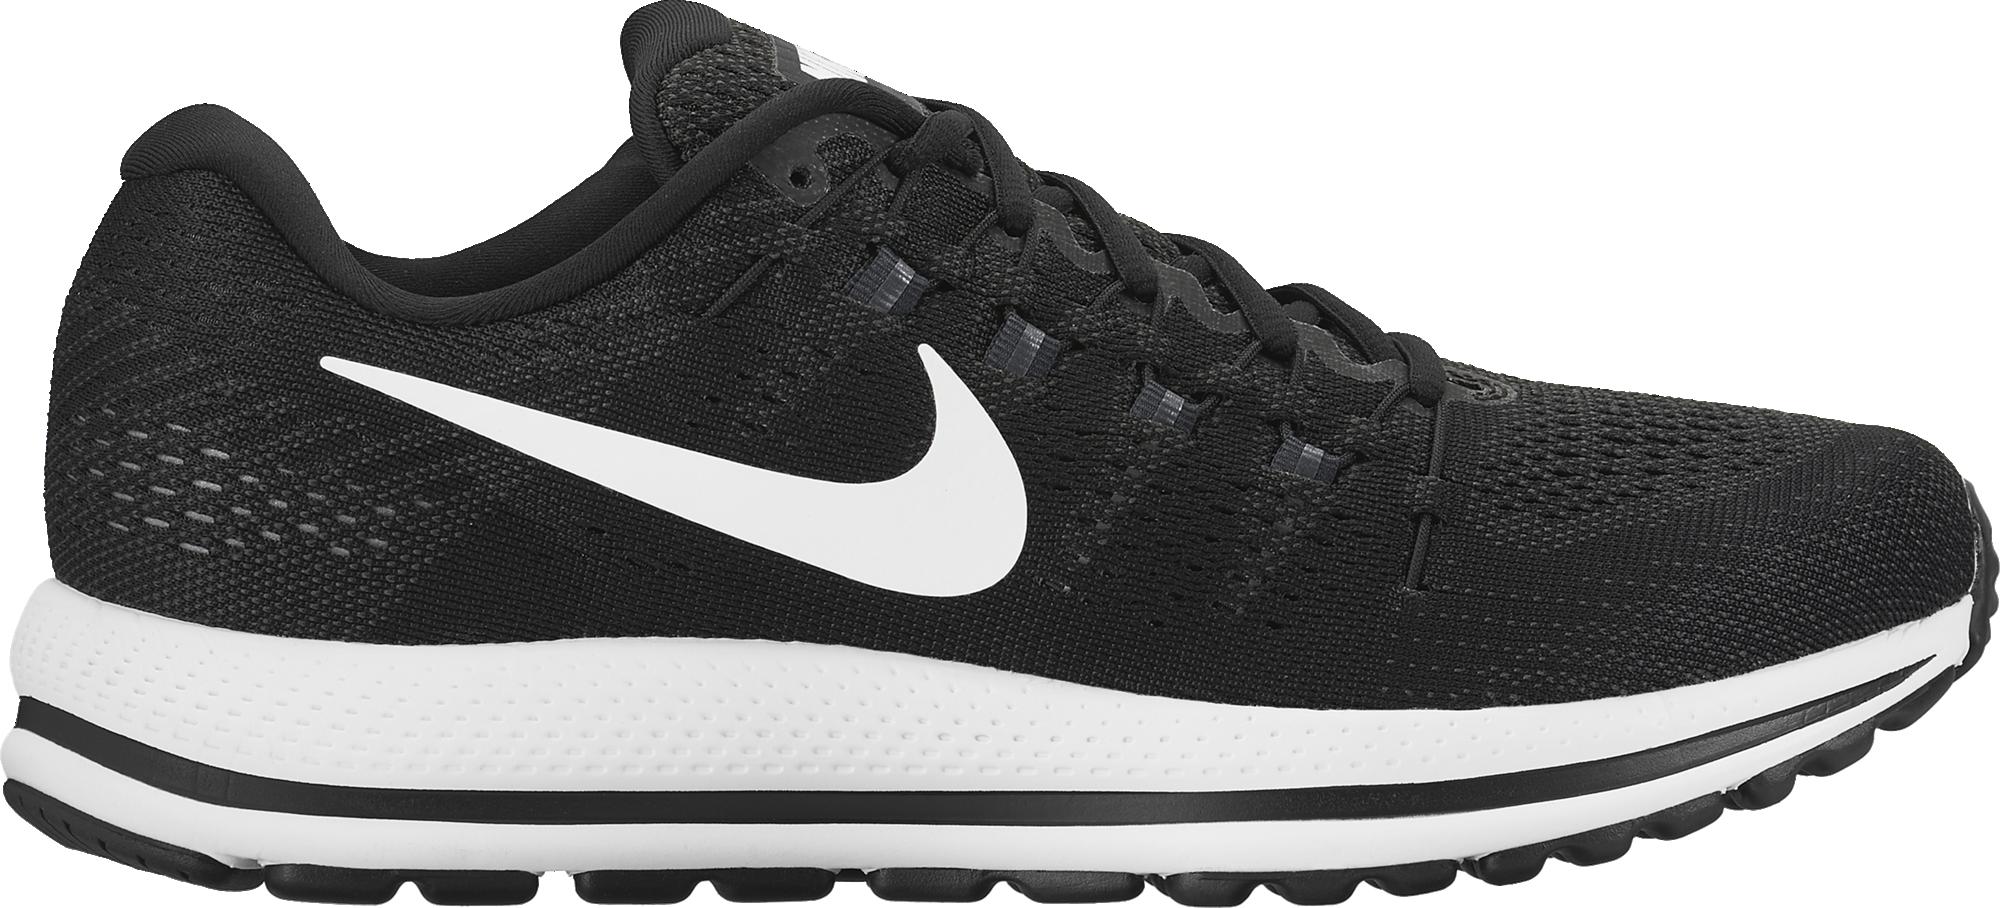 sale retailer 60652 ccfd8 Running Nike Air Zoom Vomero 12 Black/White Donna 863766-001 - Acqu...